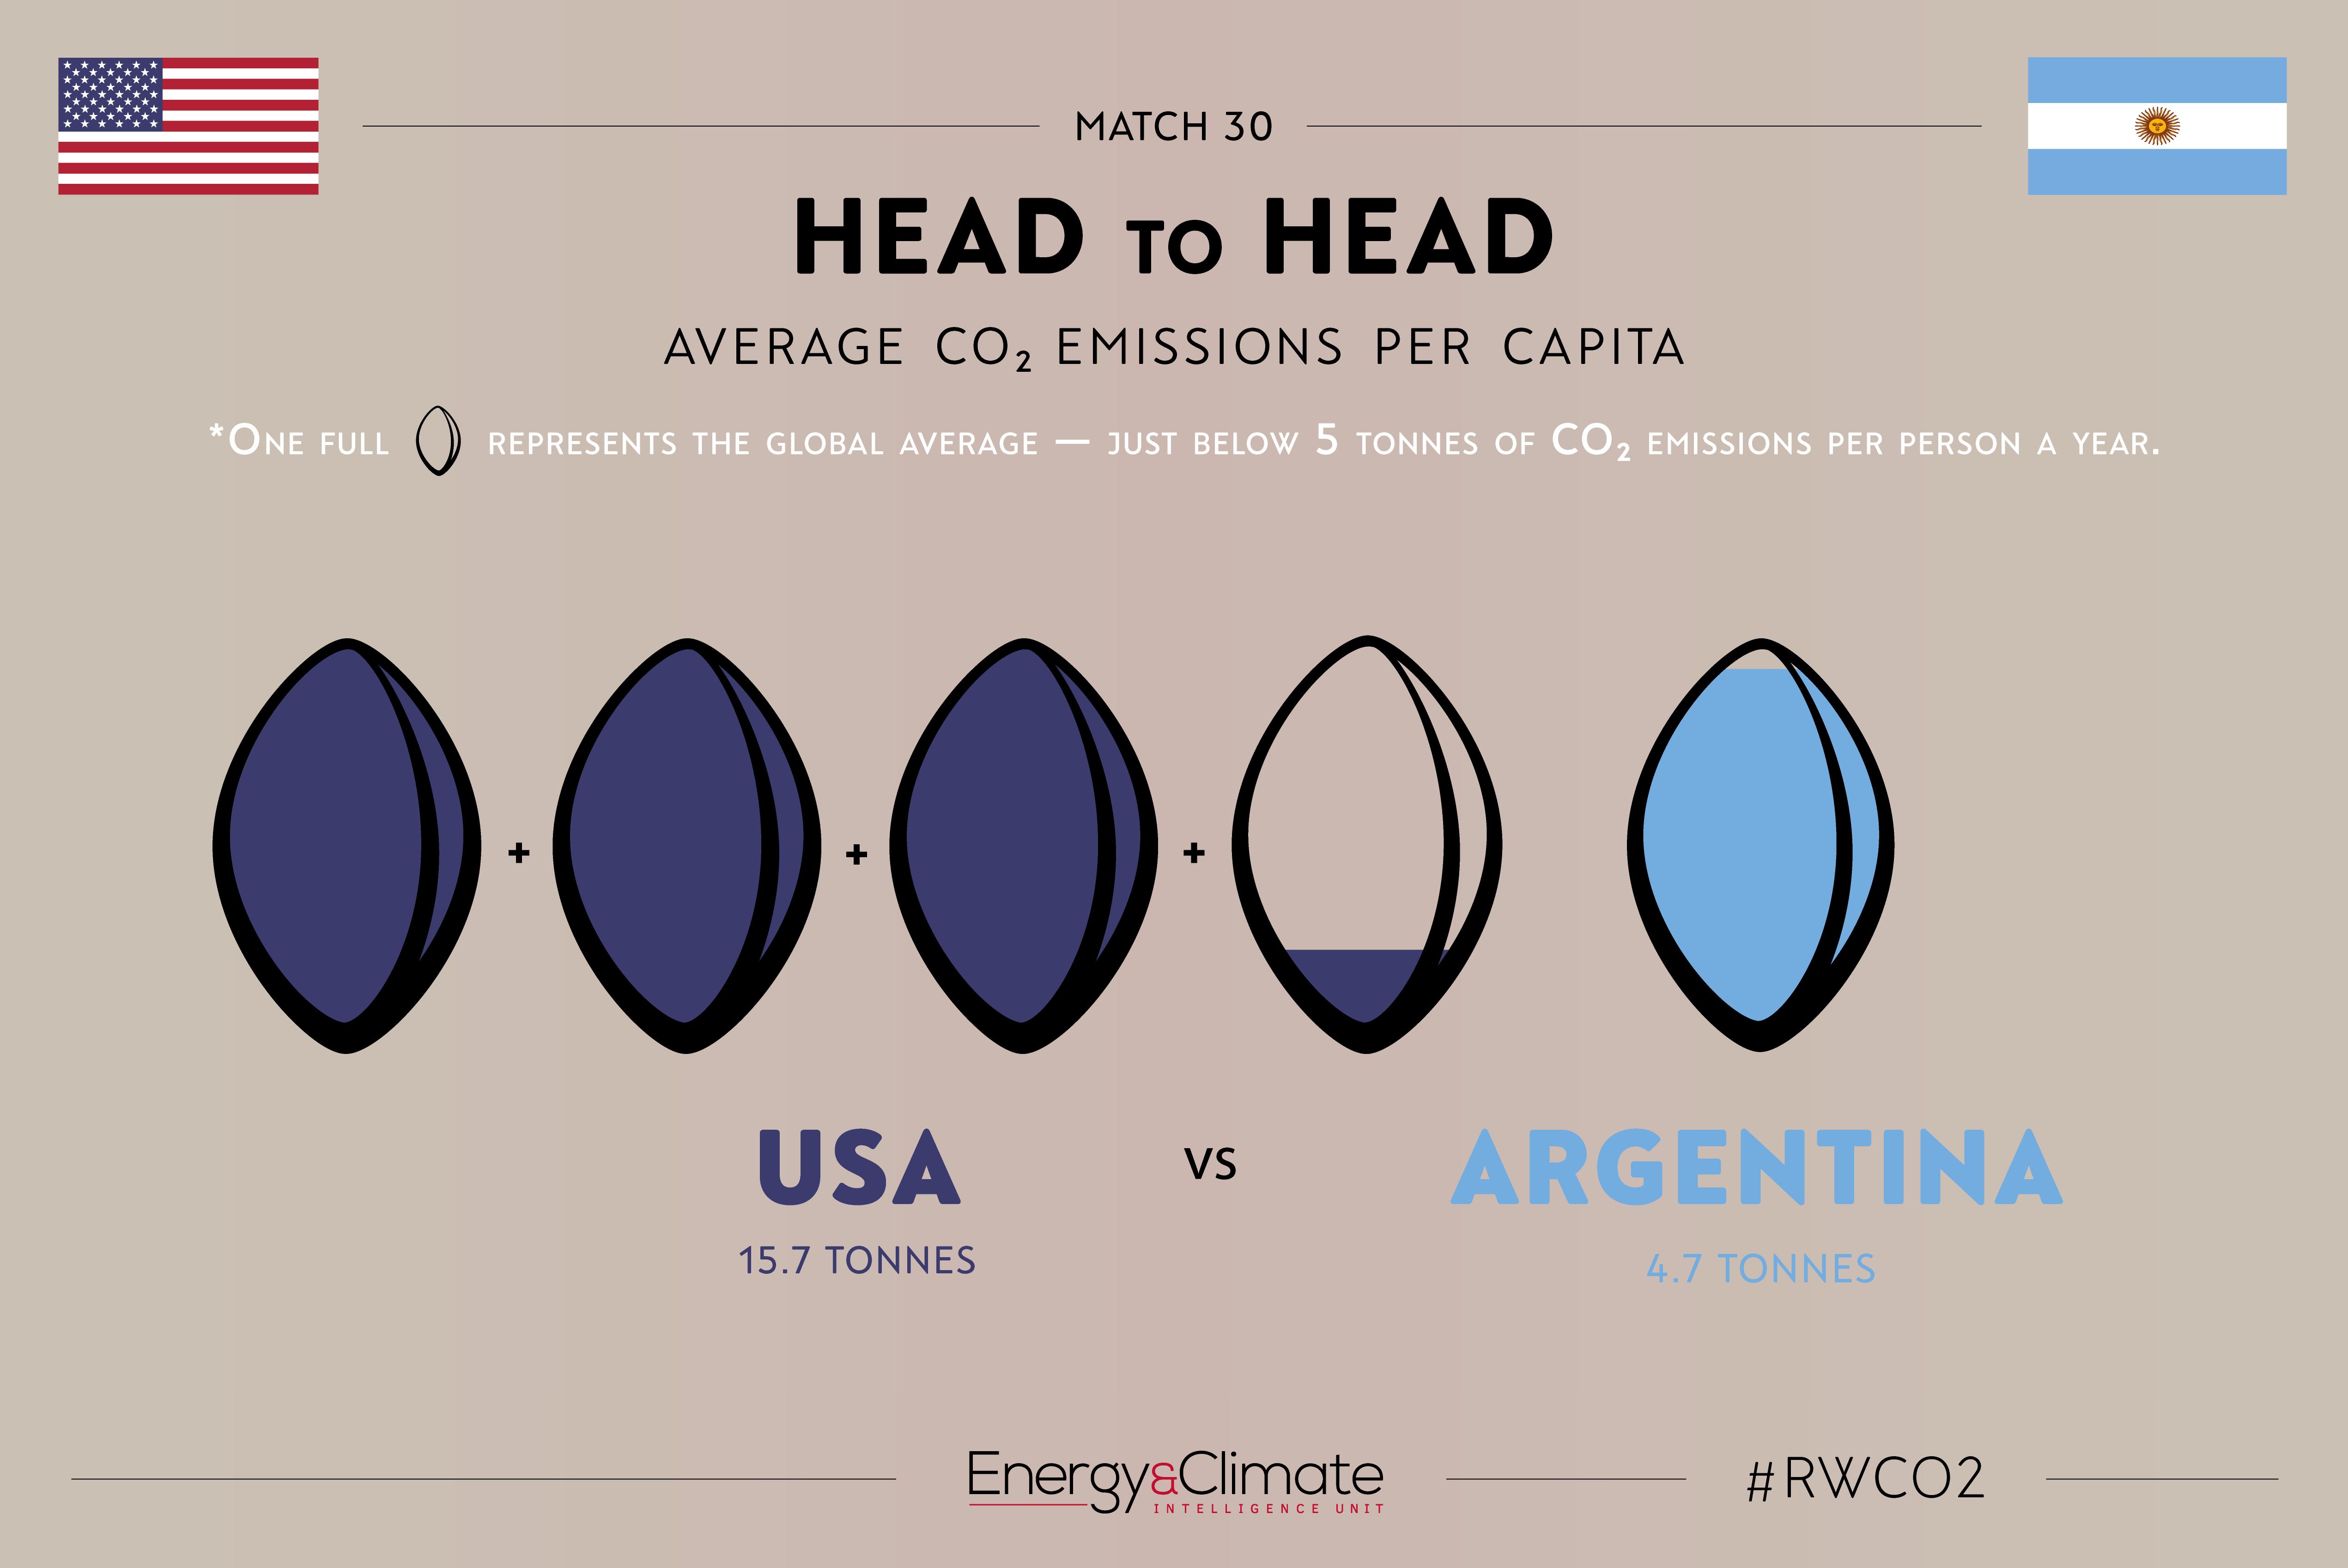 USA v Argentina per capita emissions